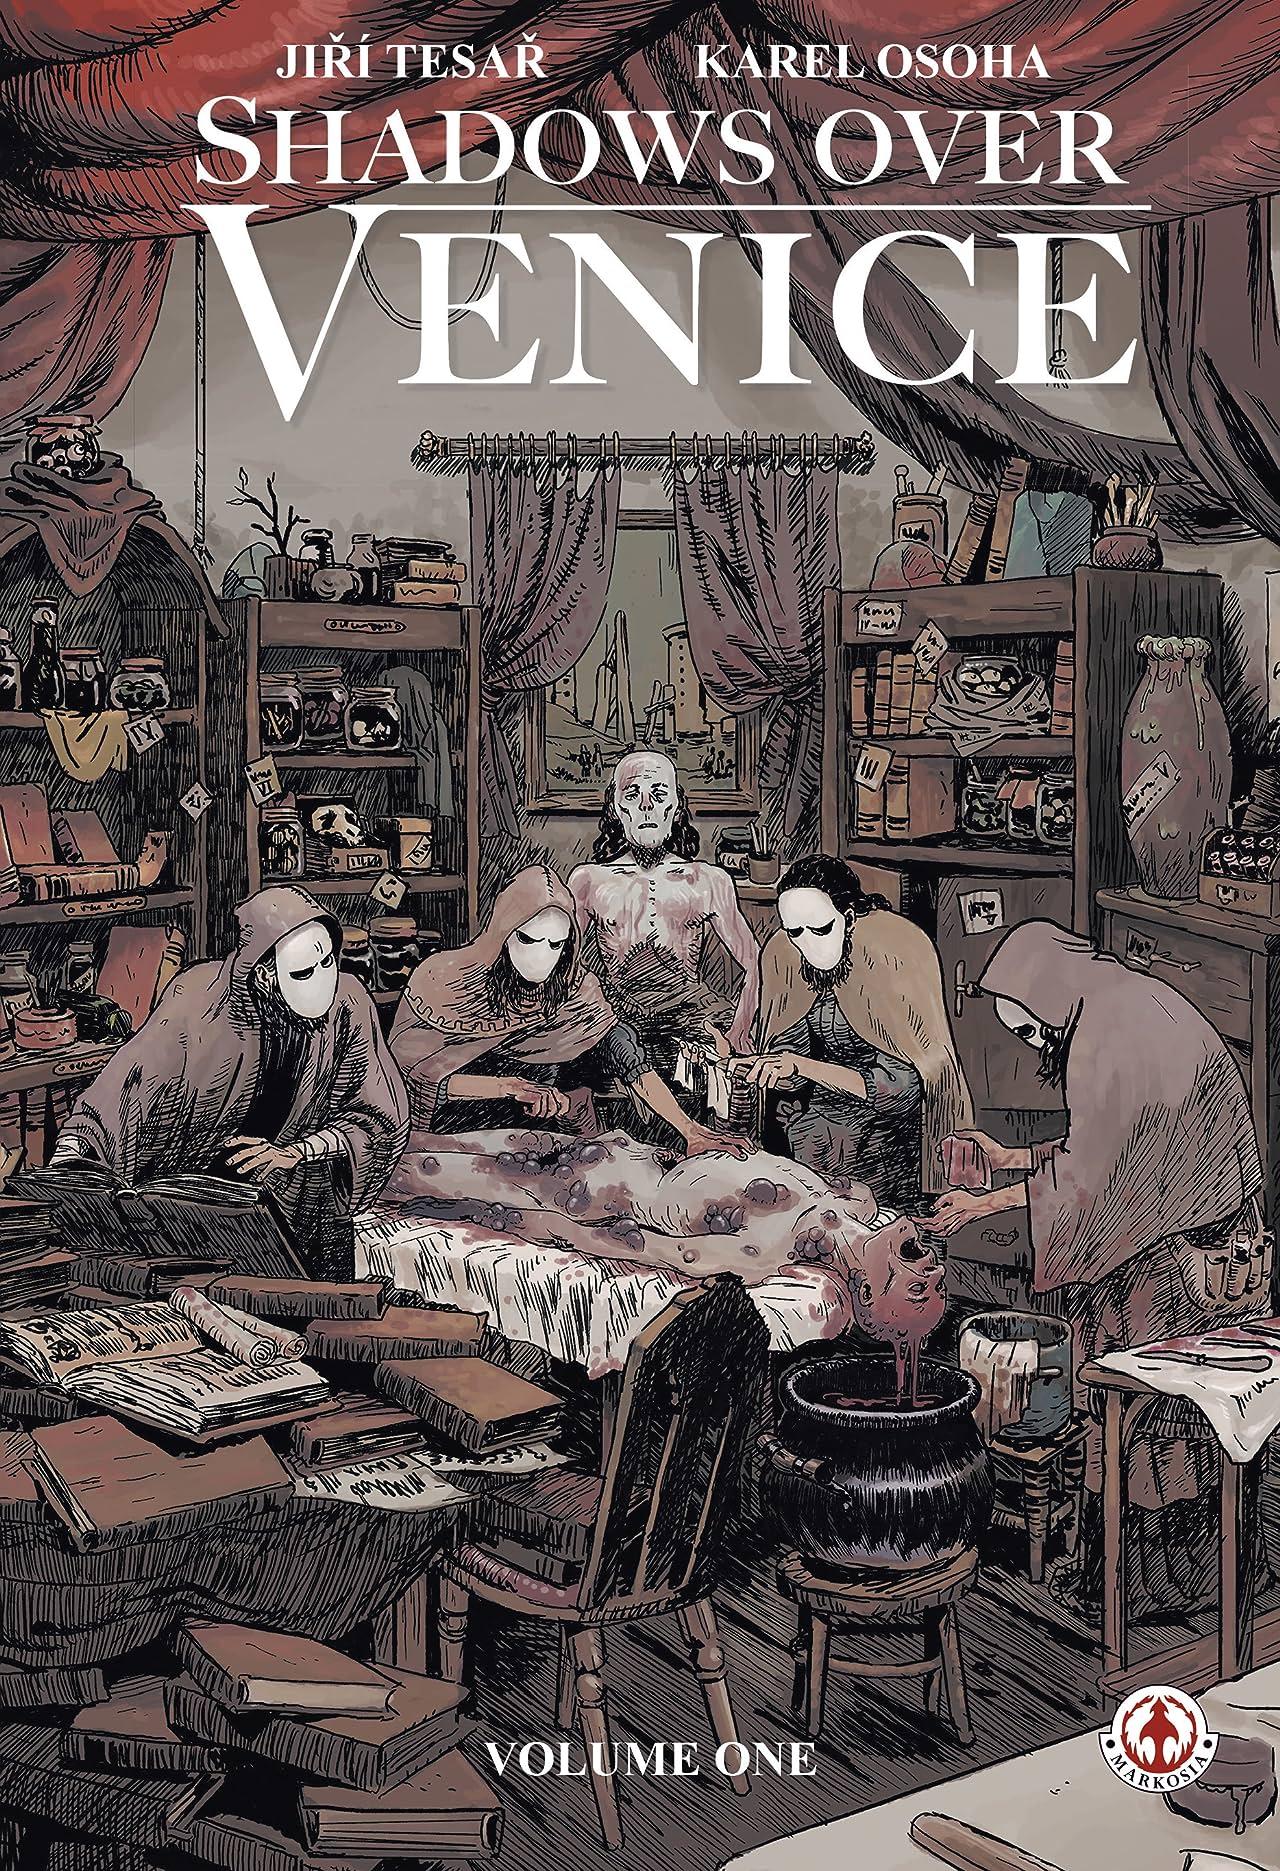 Shadows Over Venice Vol. 1